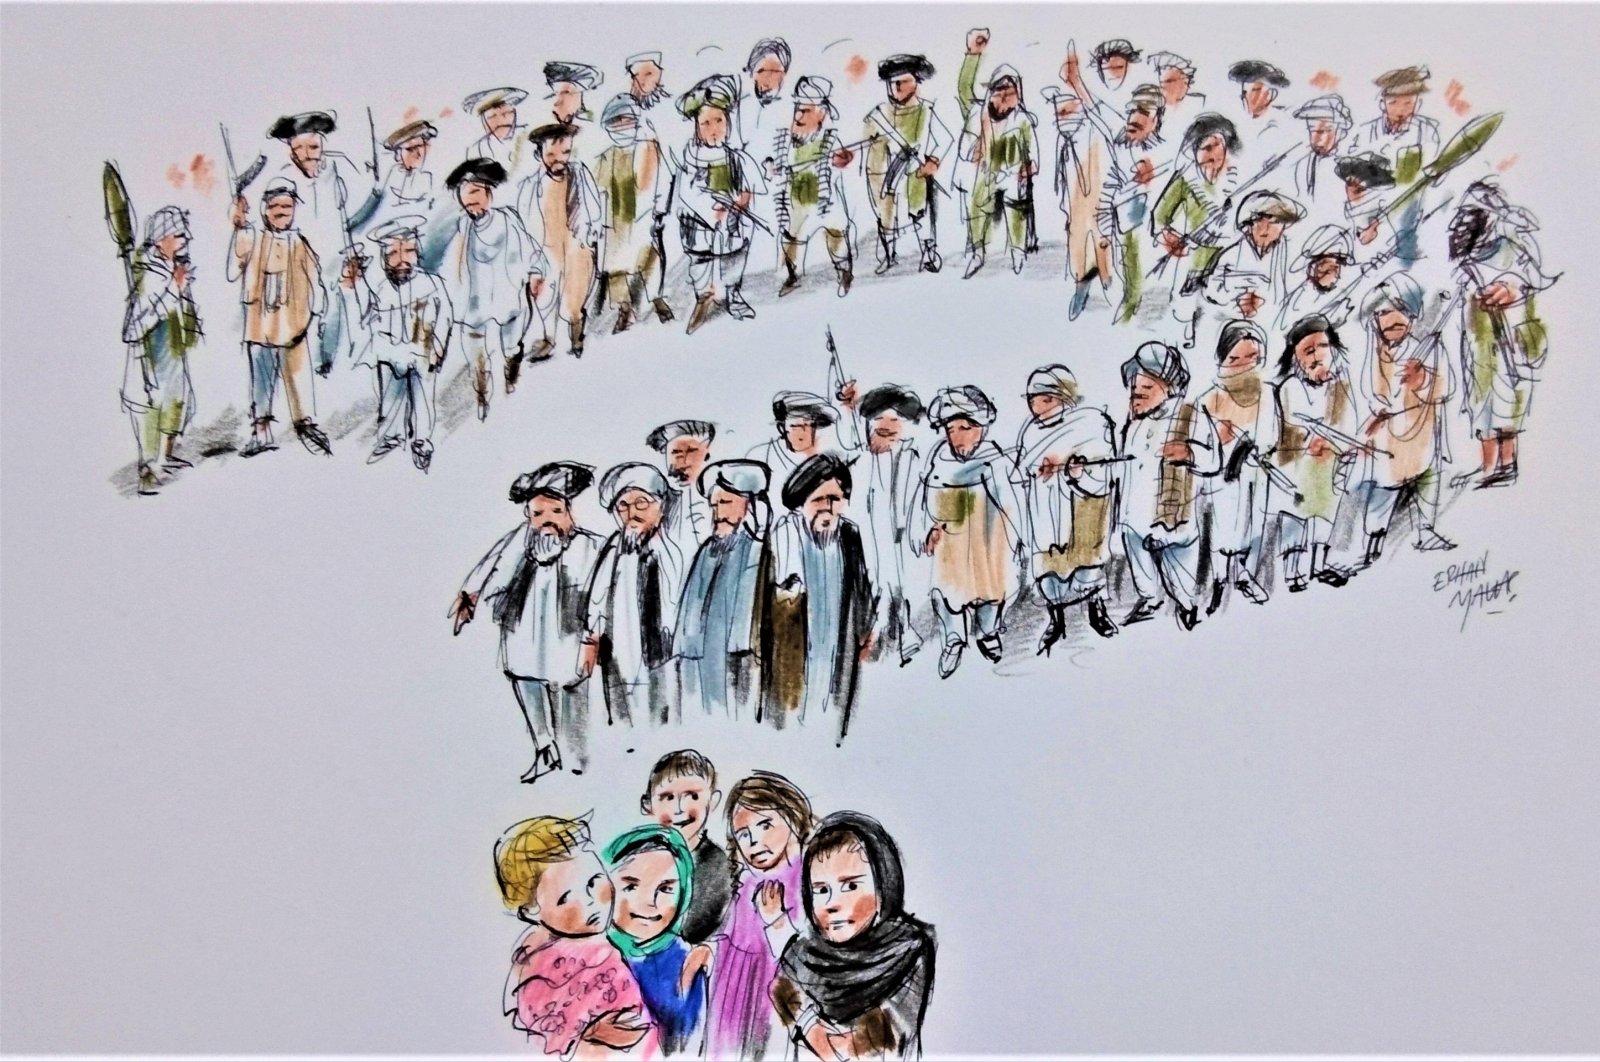 Illustration by Erhan Yalvaç, shows Afghan refugees and Taliban fighters.